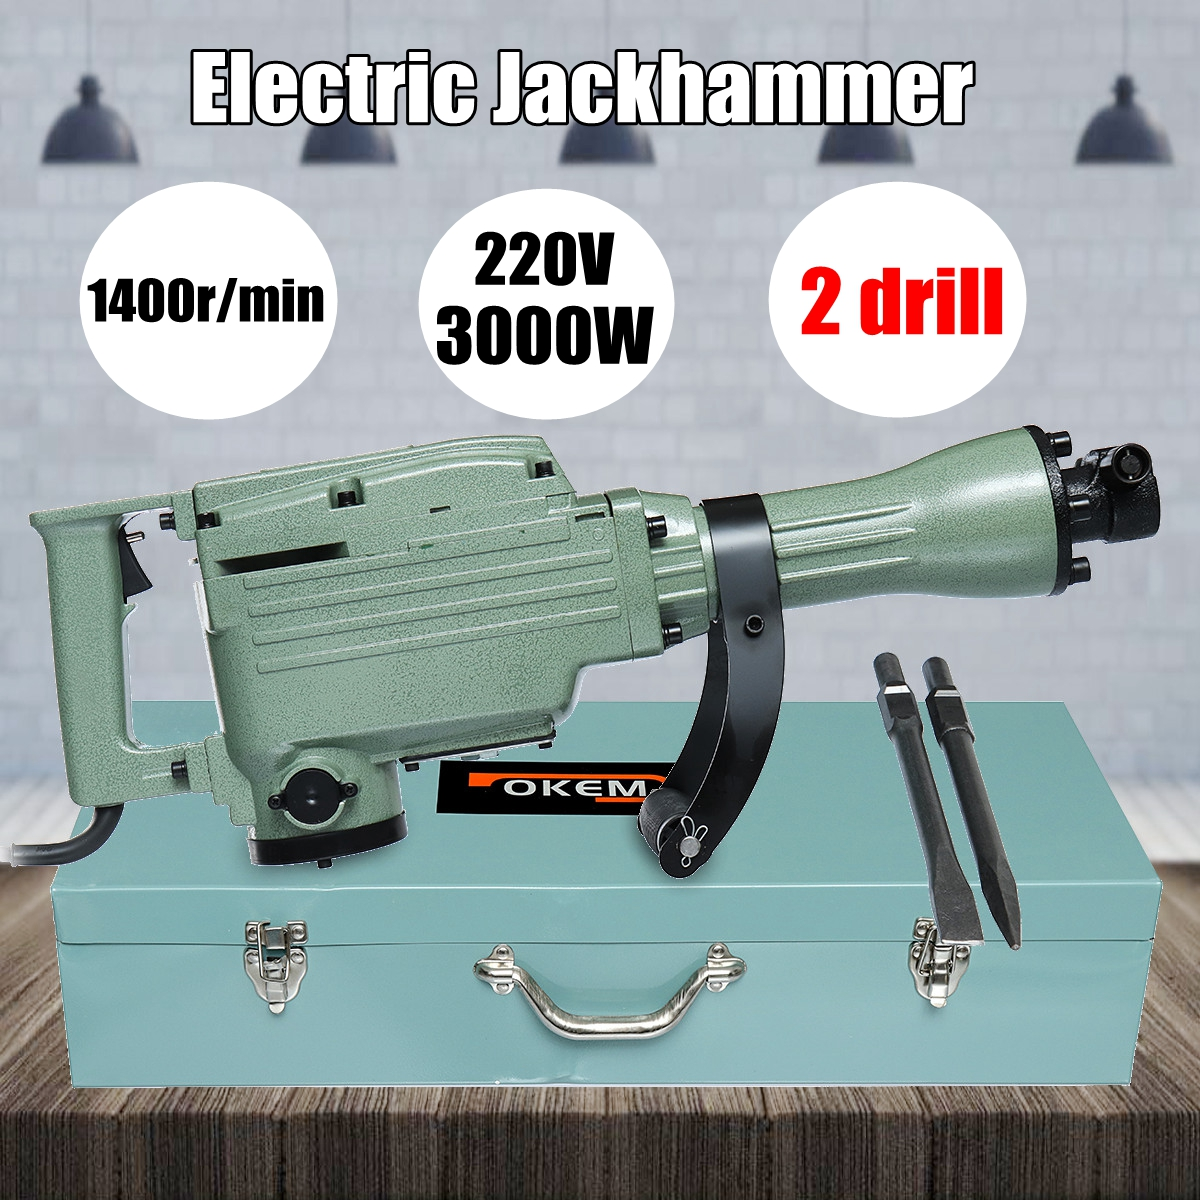 220V 3000W 1400r/min Electric Demolition Jack Hammer Concrete Breaker Drill Chisel Tool Kit NEW стоимость